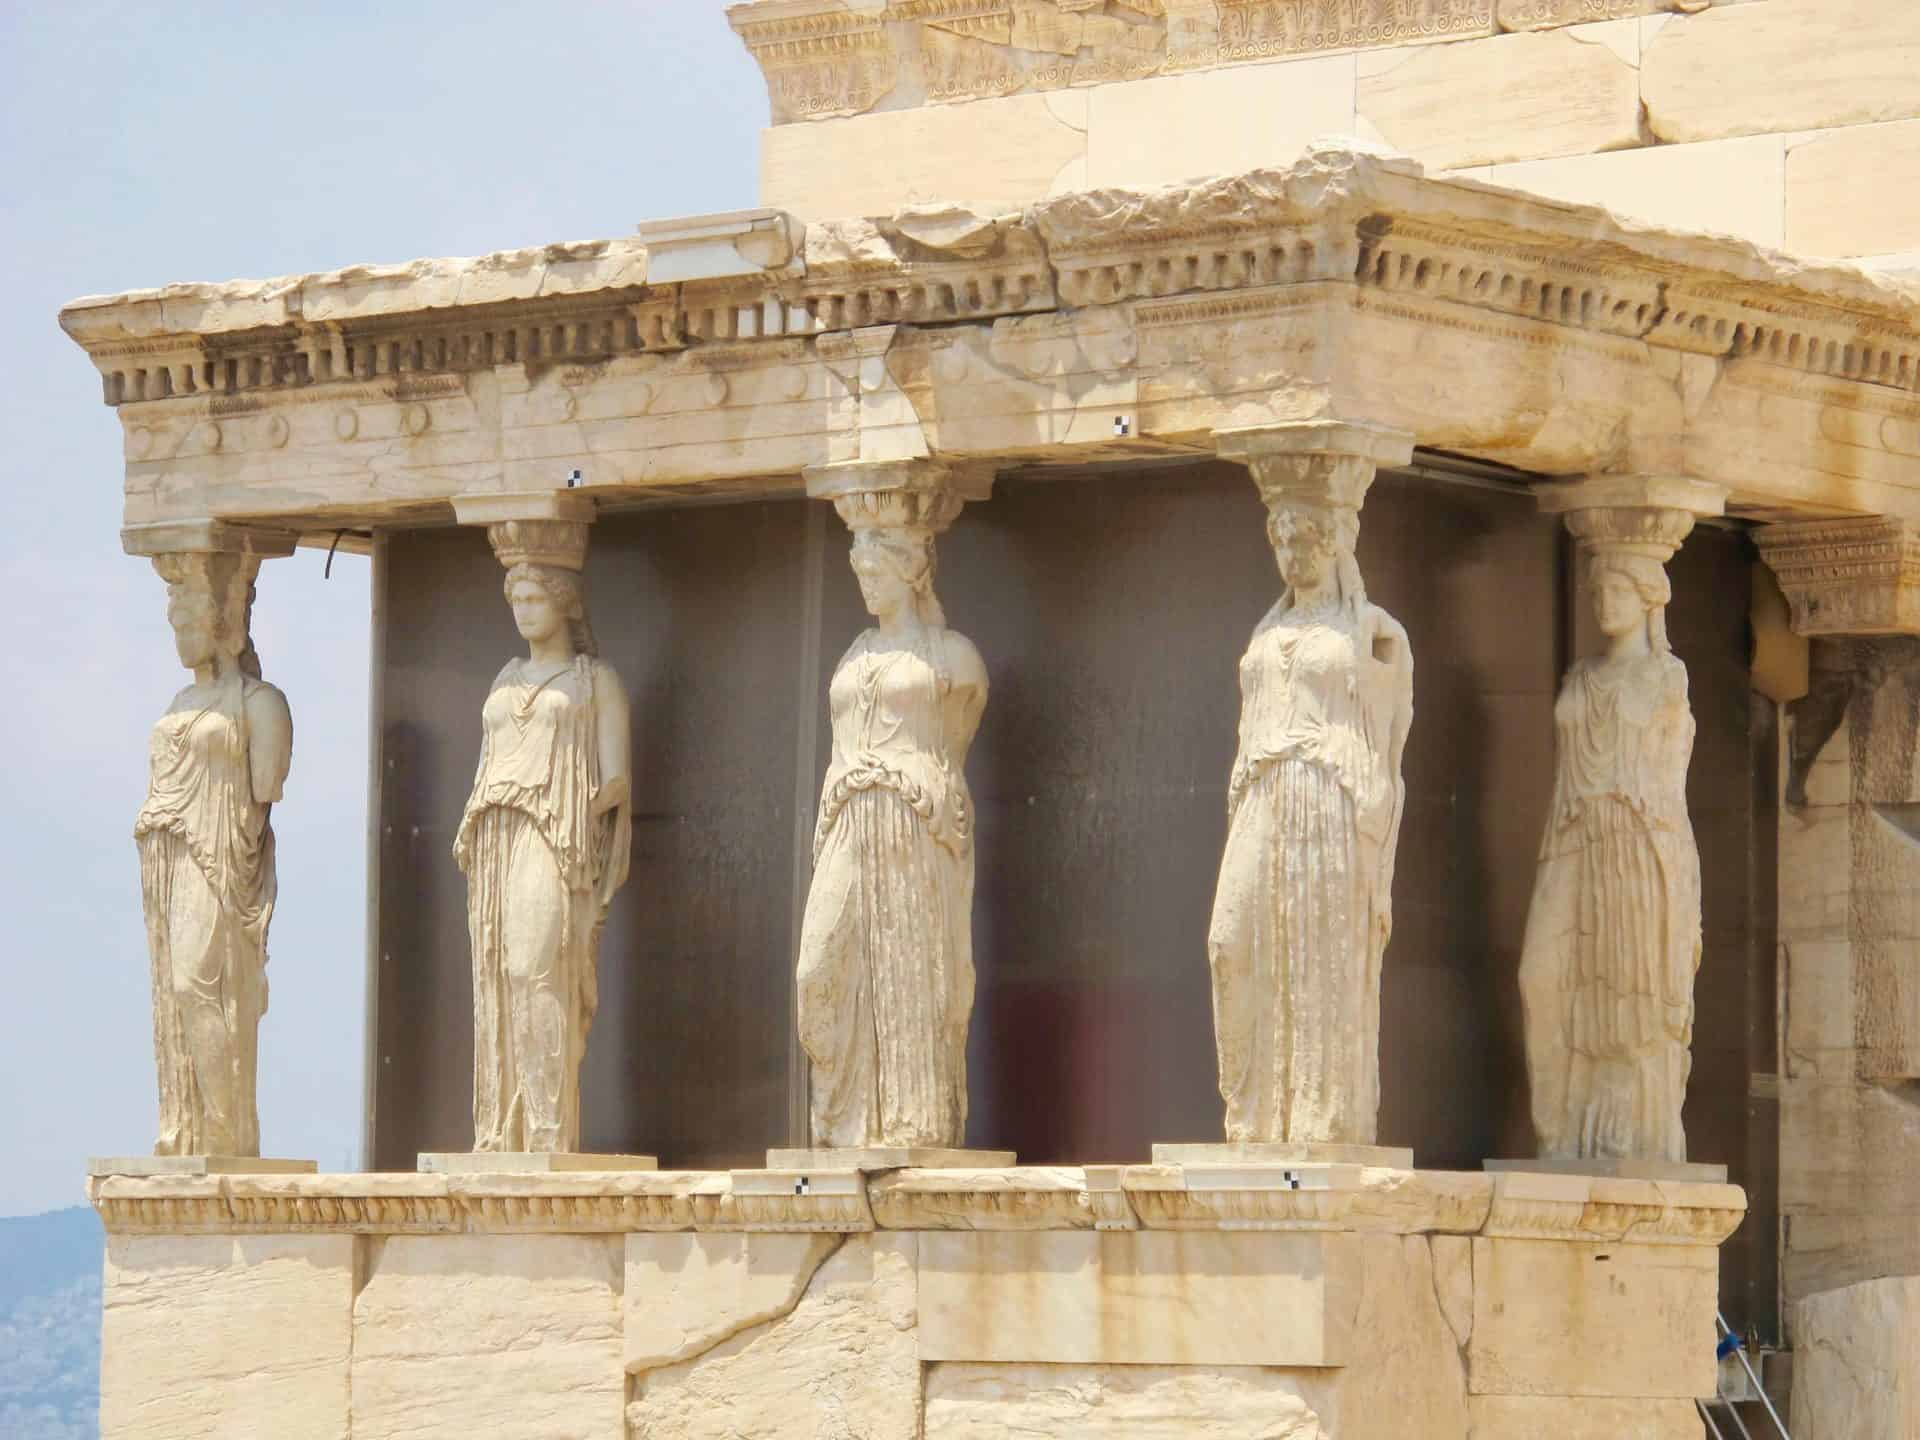 athens_acropolis16-The-Caryatid-Porch-37.97178, 23.72664